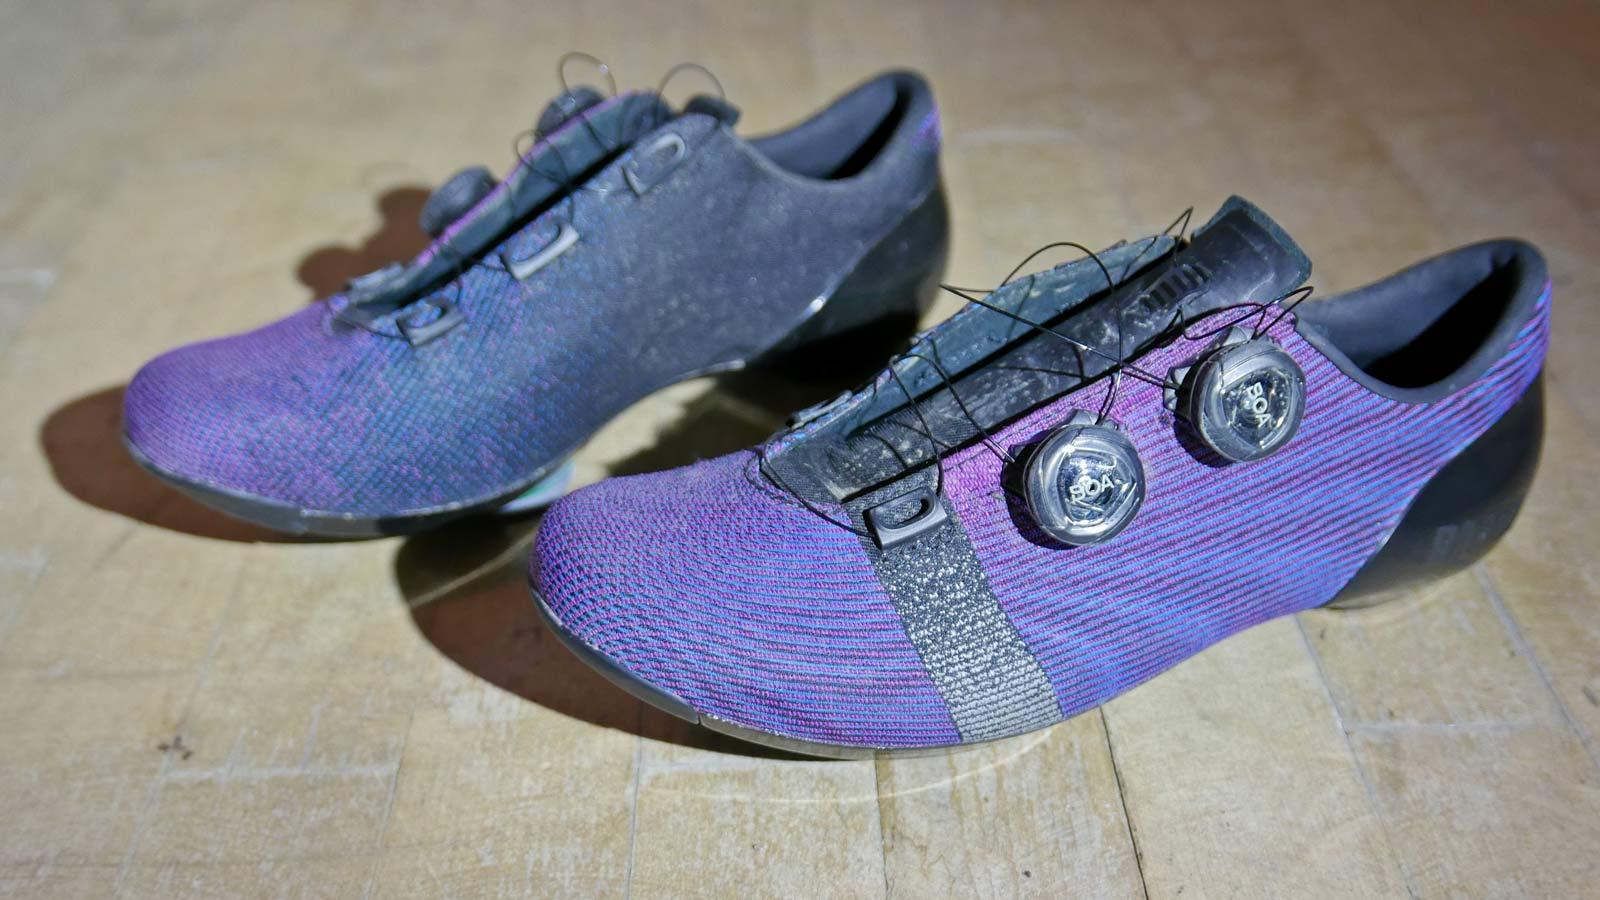 Rapha-Pro-Team-Powerweave-carbon-road-bike-shoes_pair.jpg